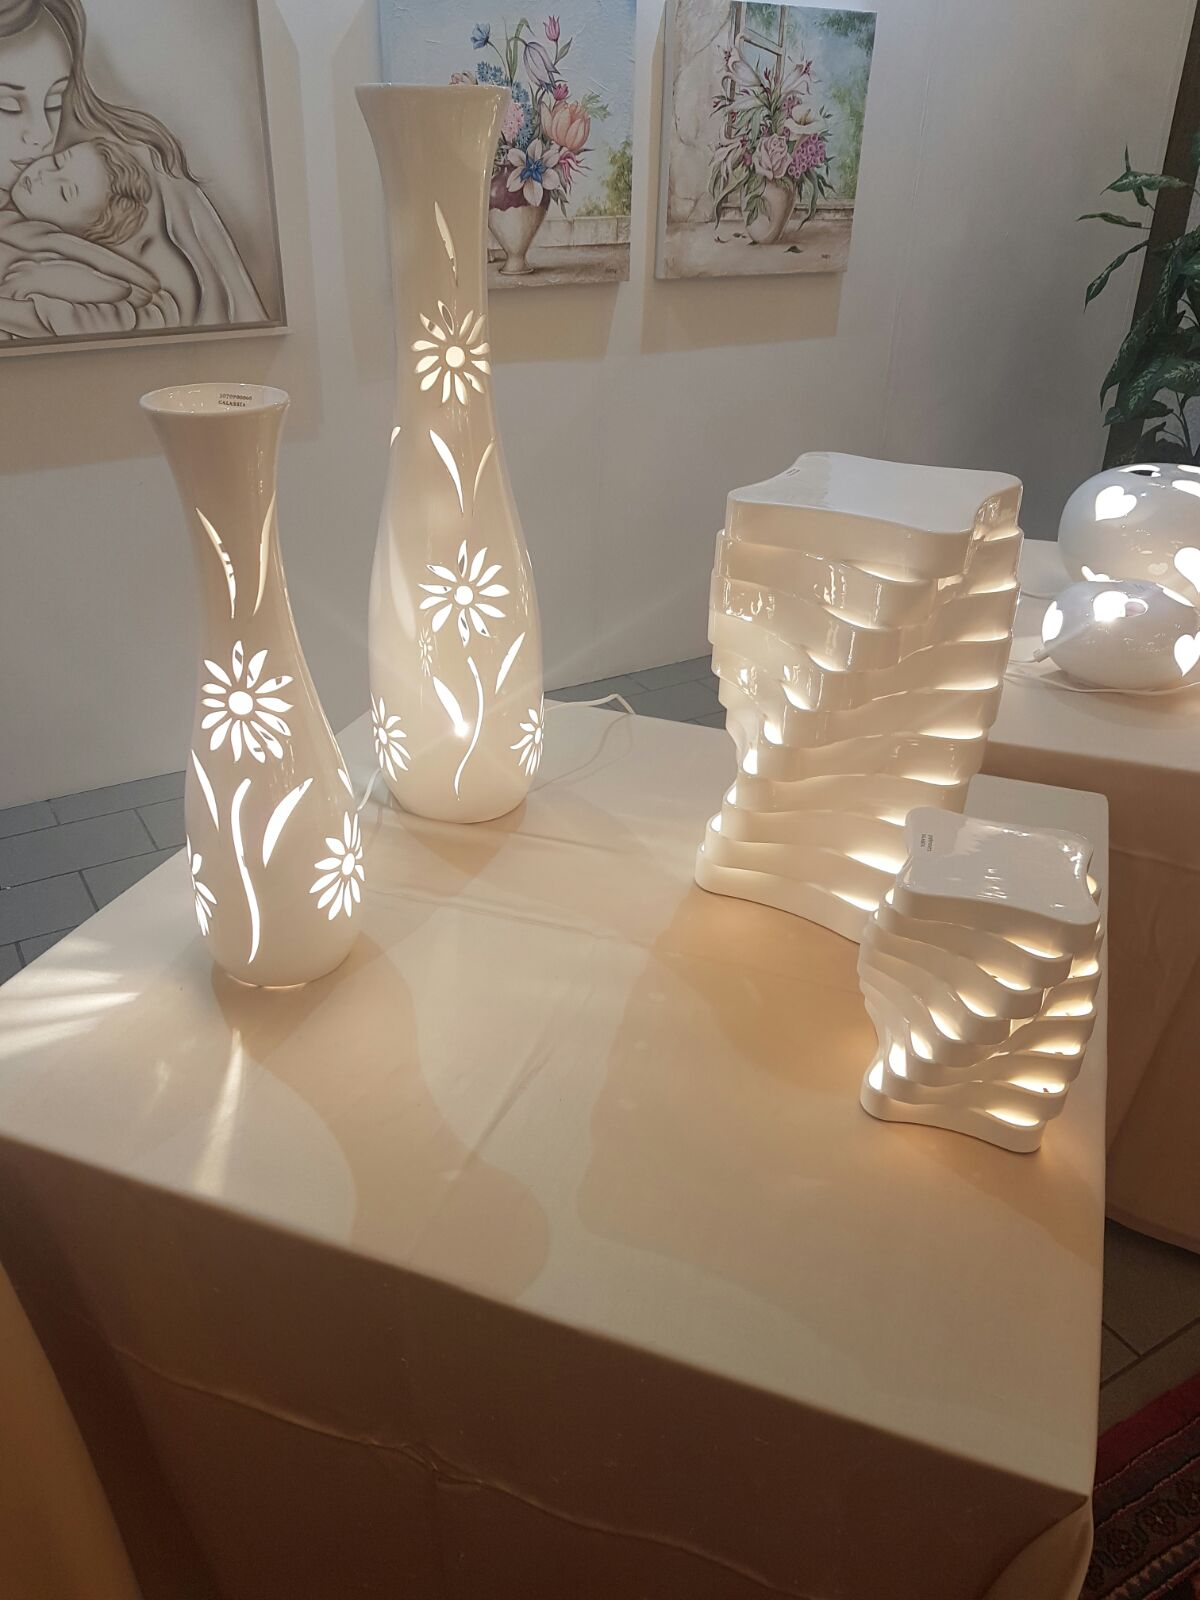 4 lampade particolari su un tavolino